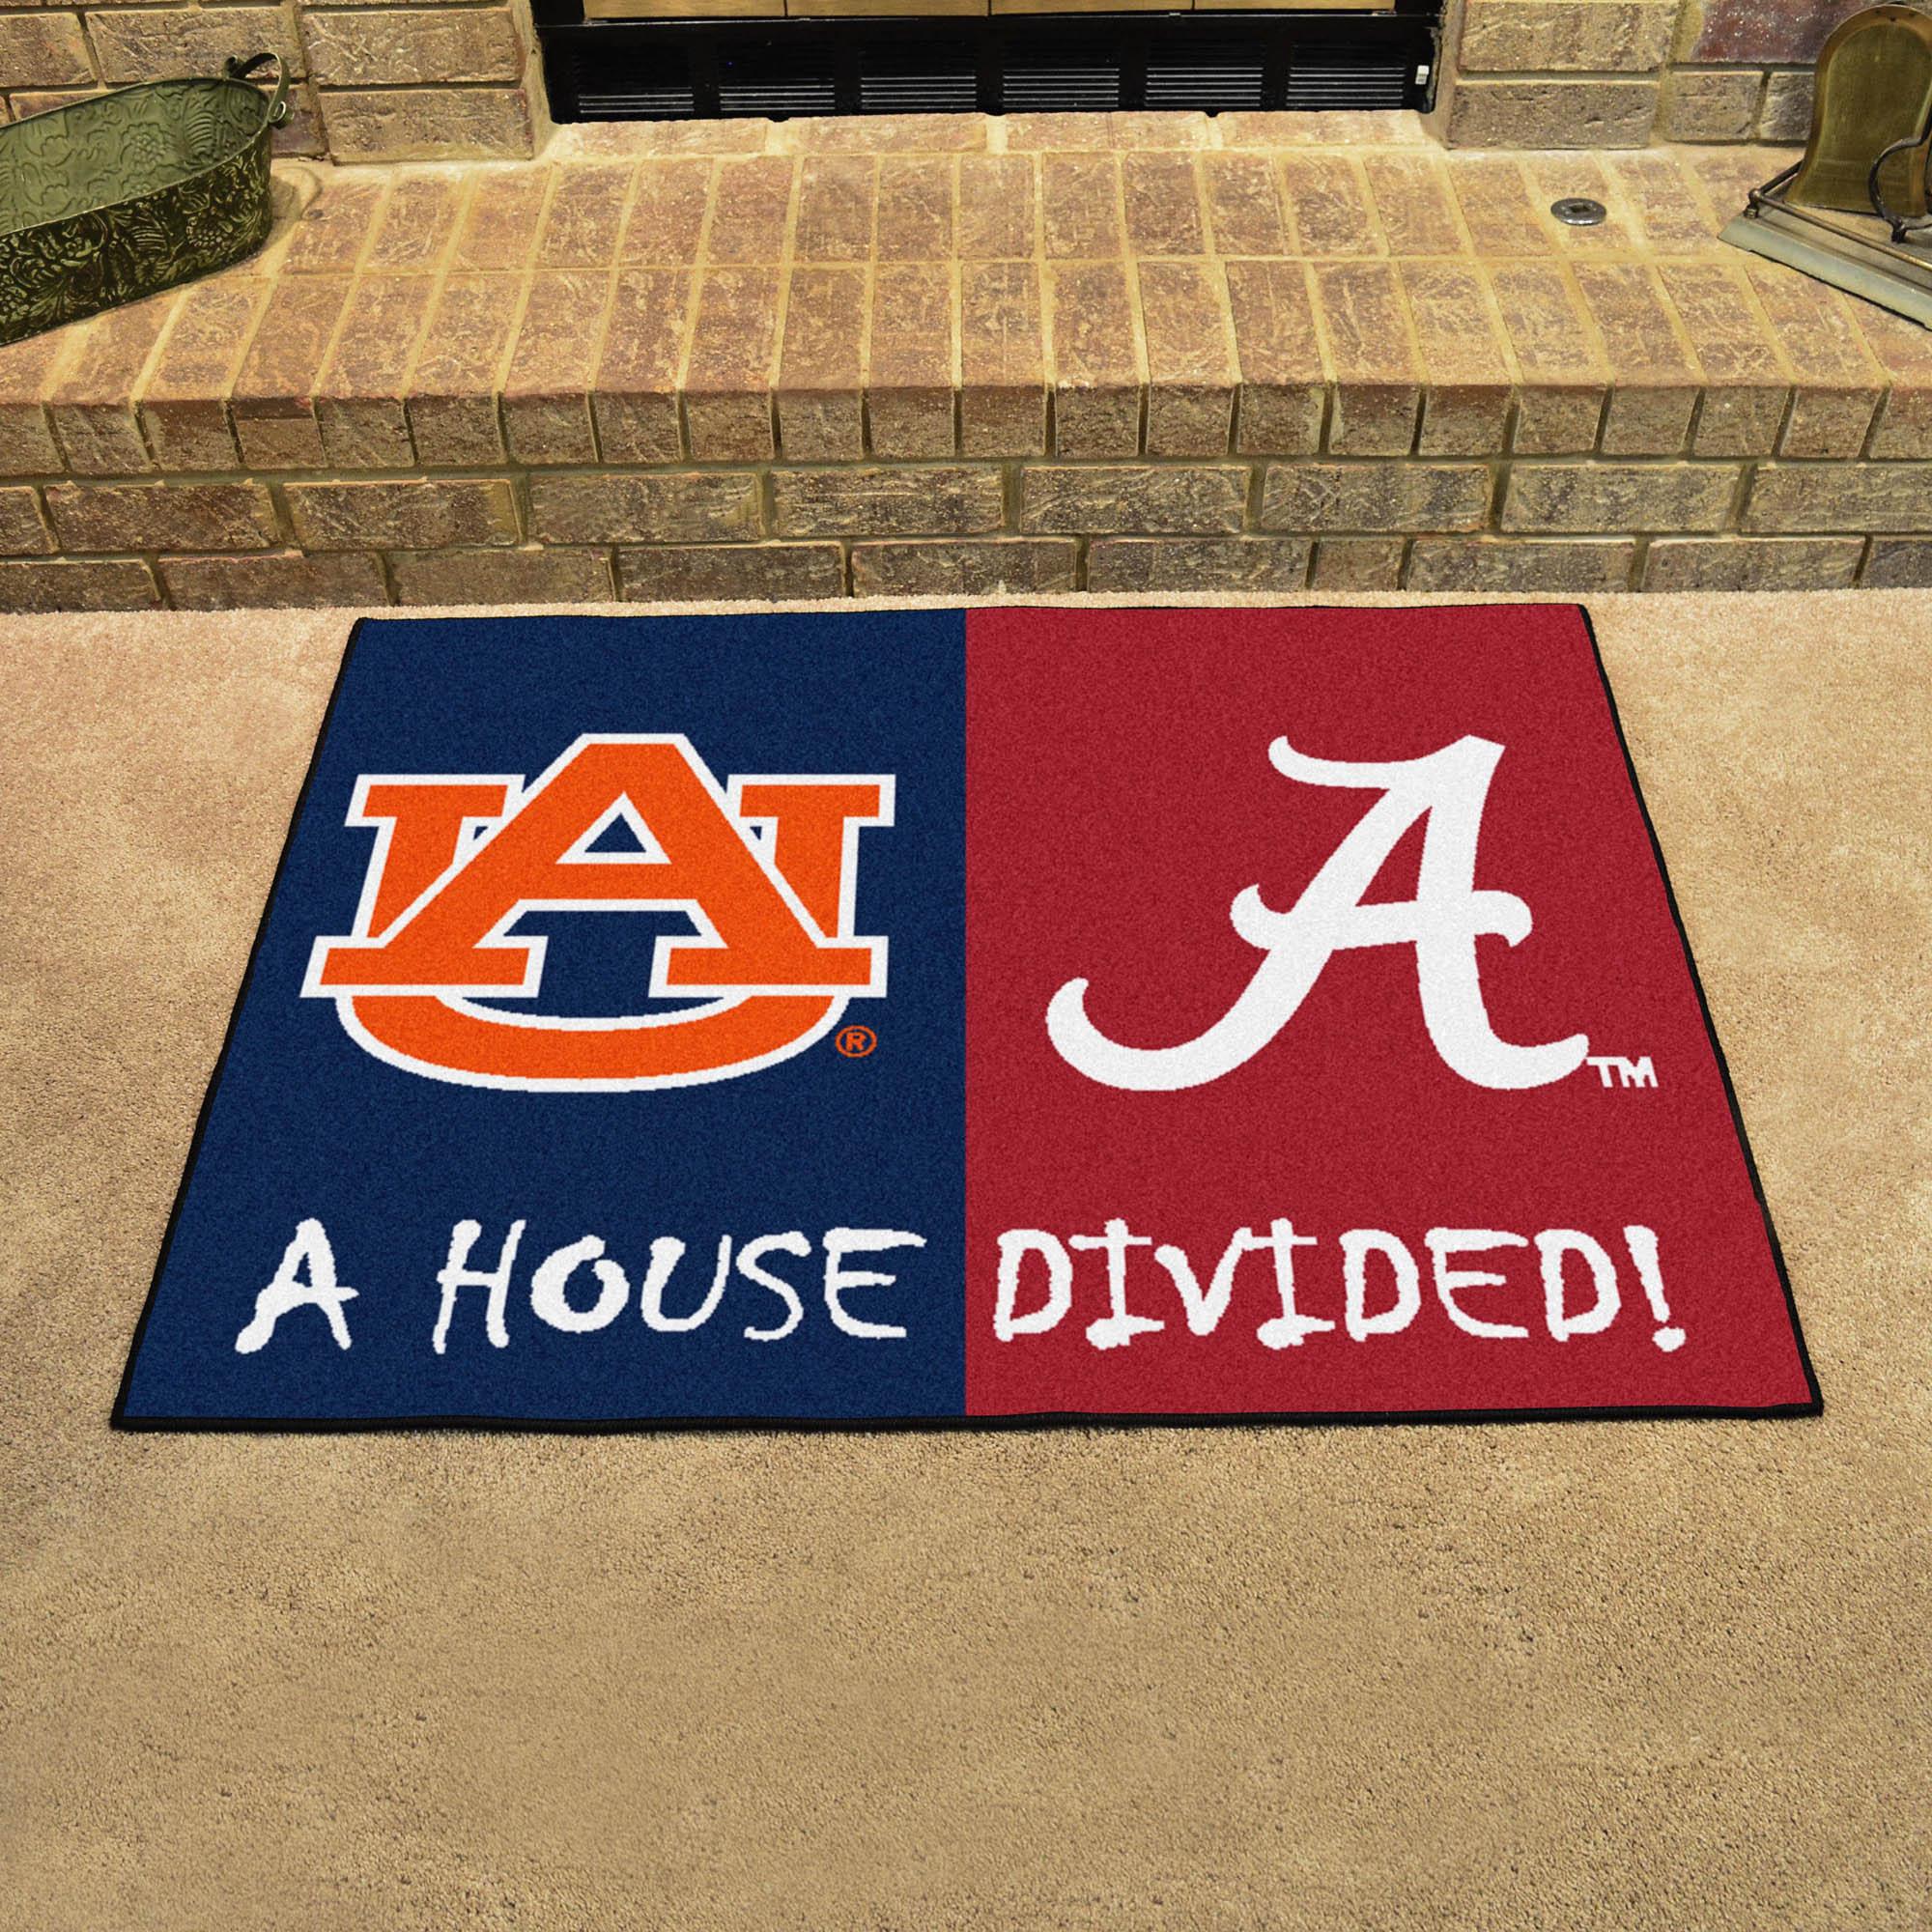 NCAA House Divided Rivalry Rug Alabama Crimson Tide